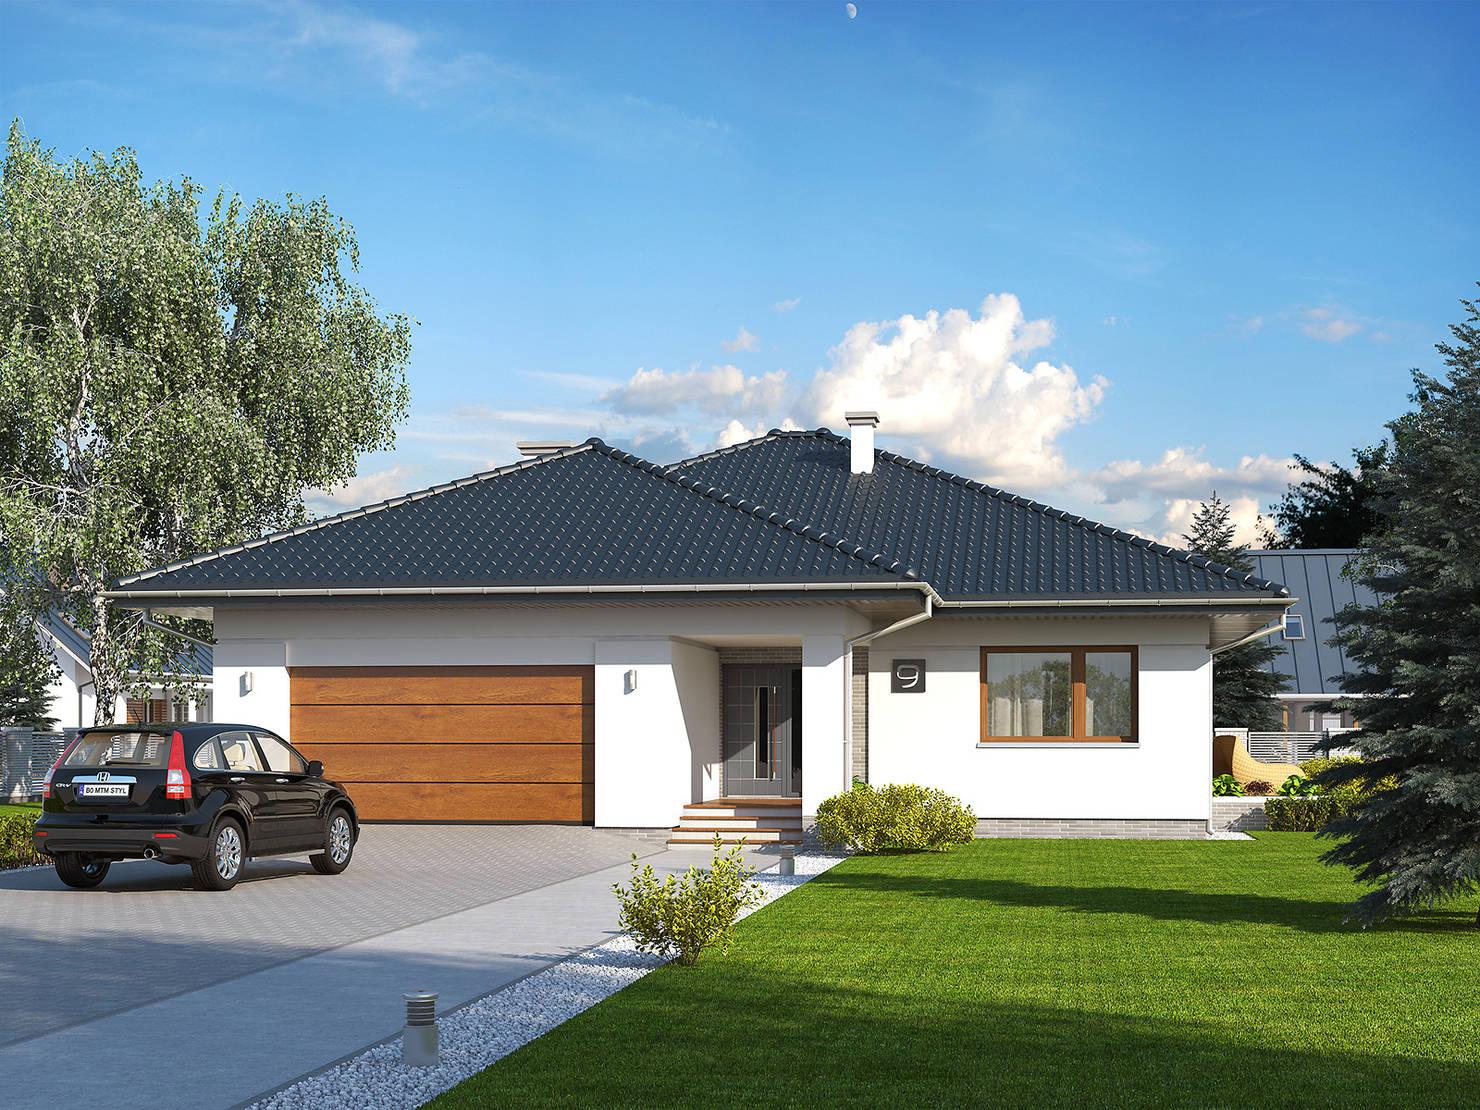 11 smart modular homes for you to copy